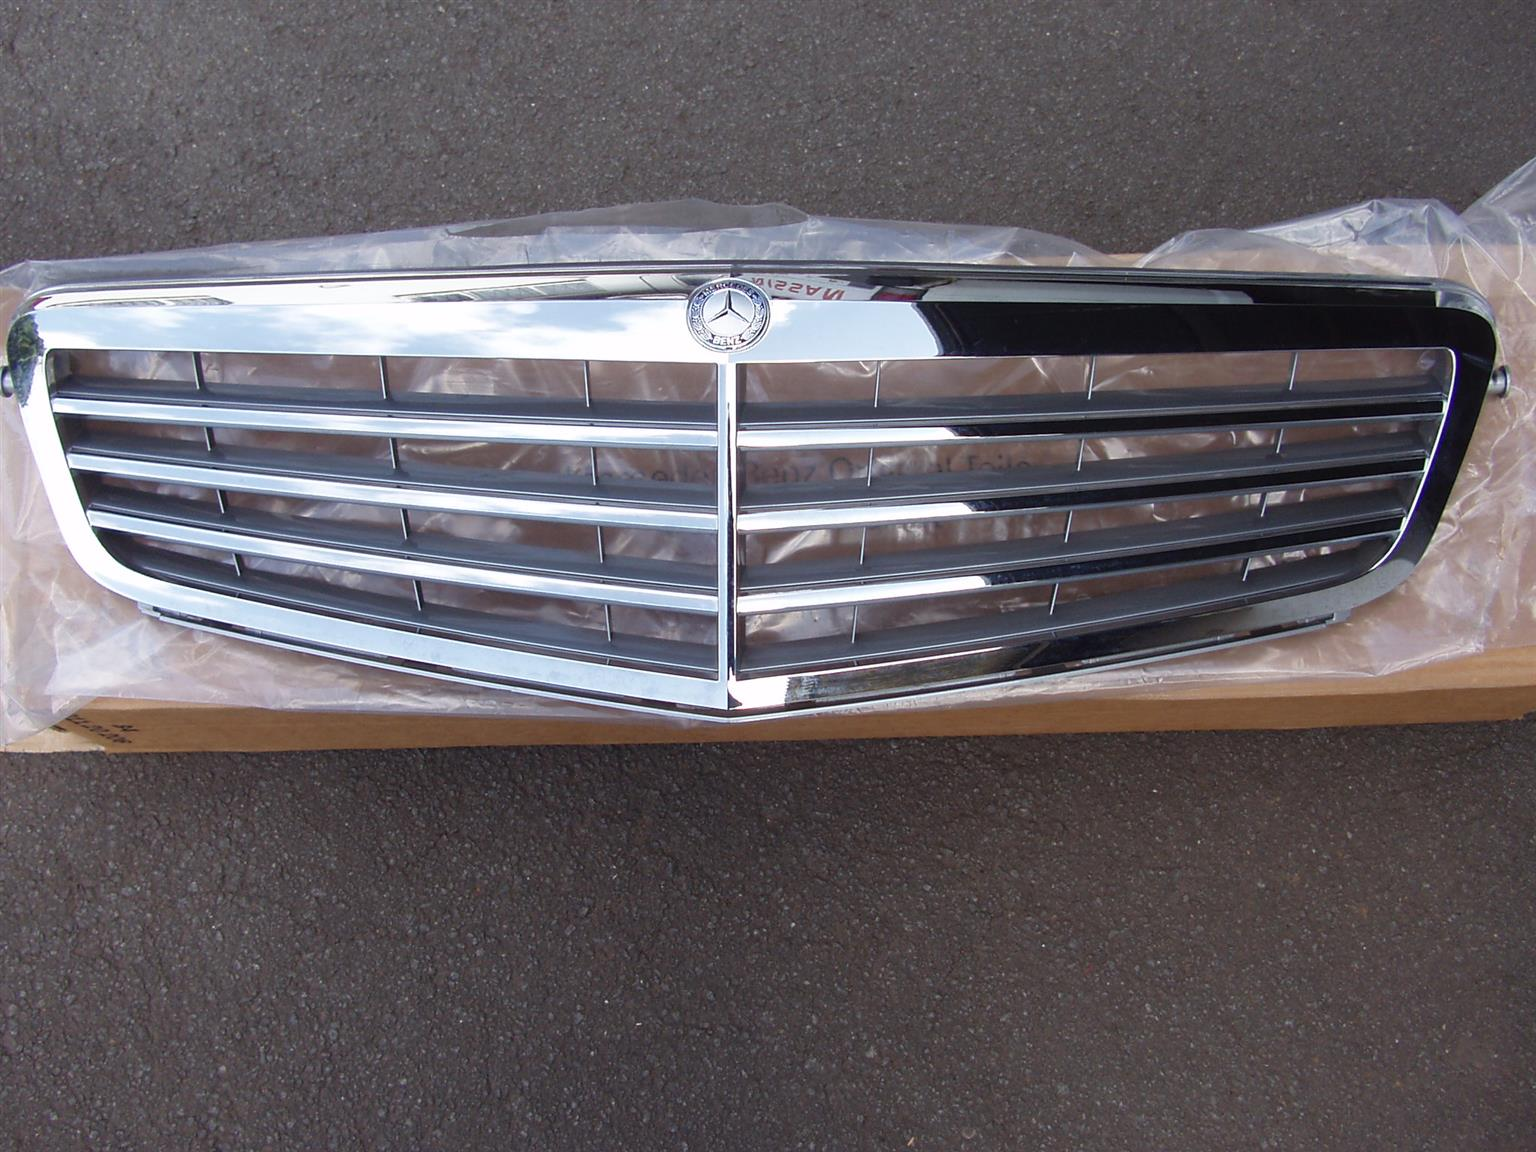 Mercedes Benz Grille - Original Part - Part Number A 204 880 0023 9776 - New